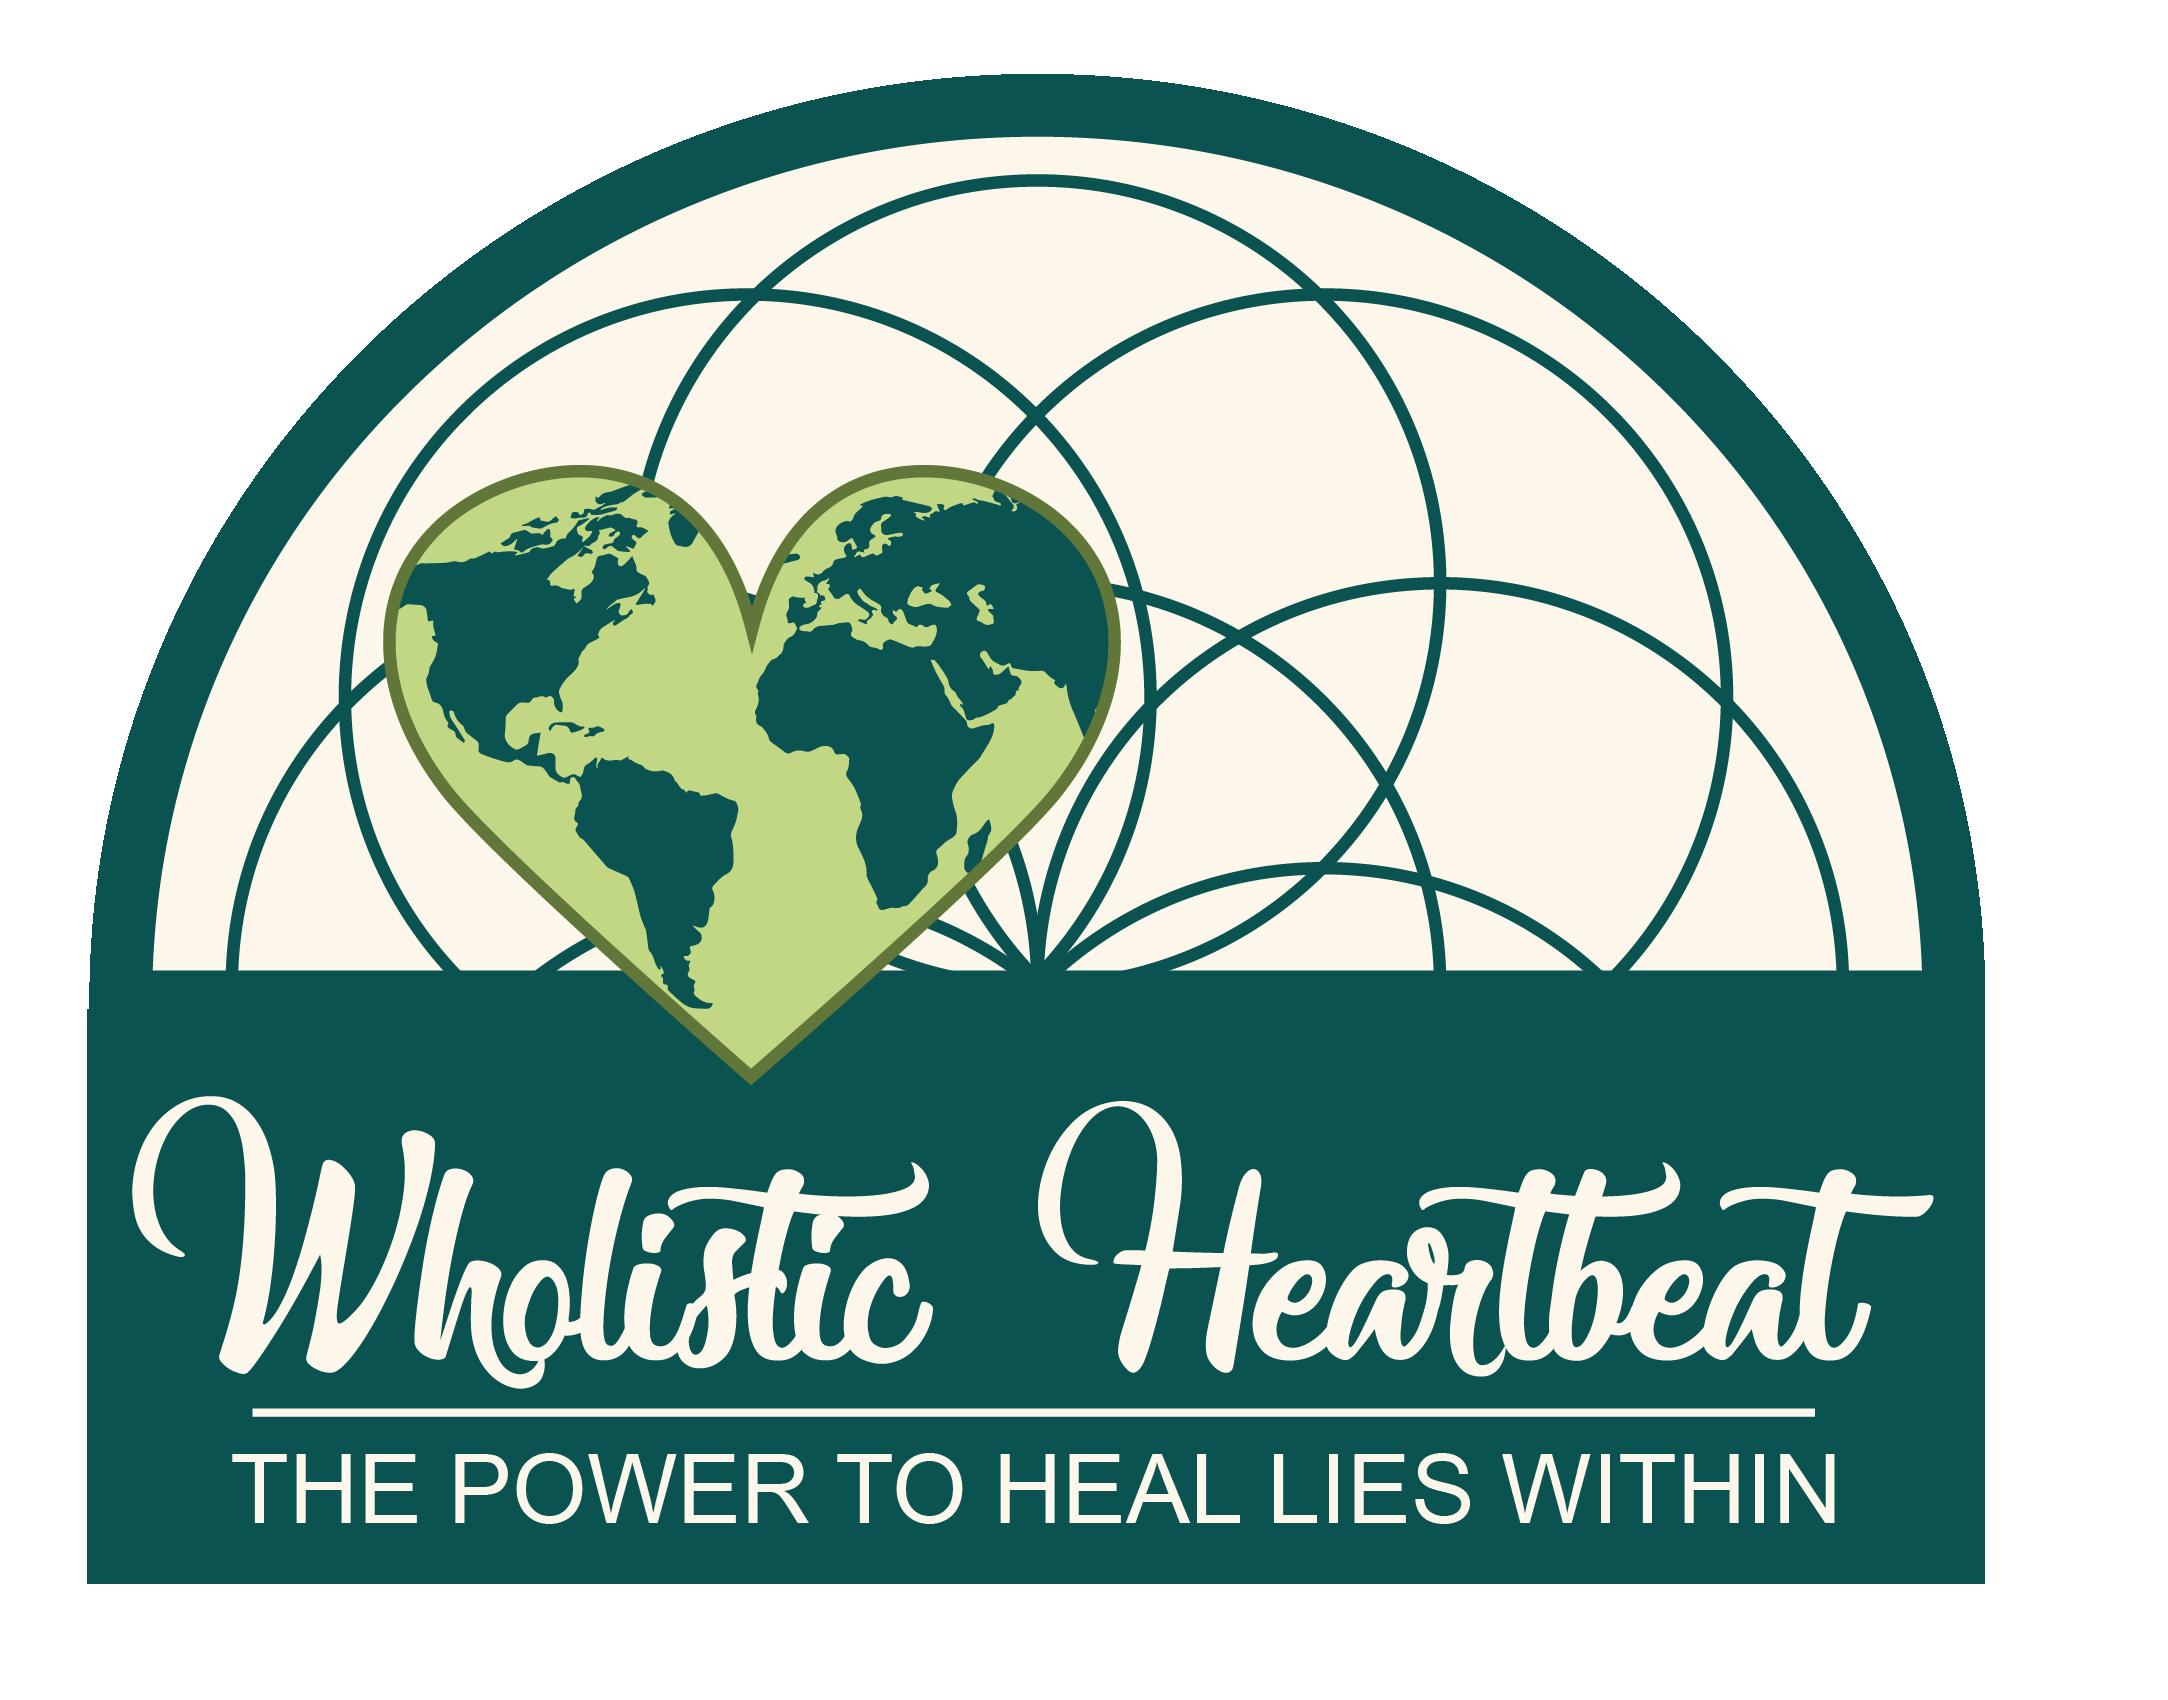 WholisticHeartbeat-01